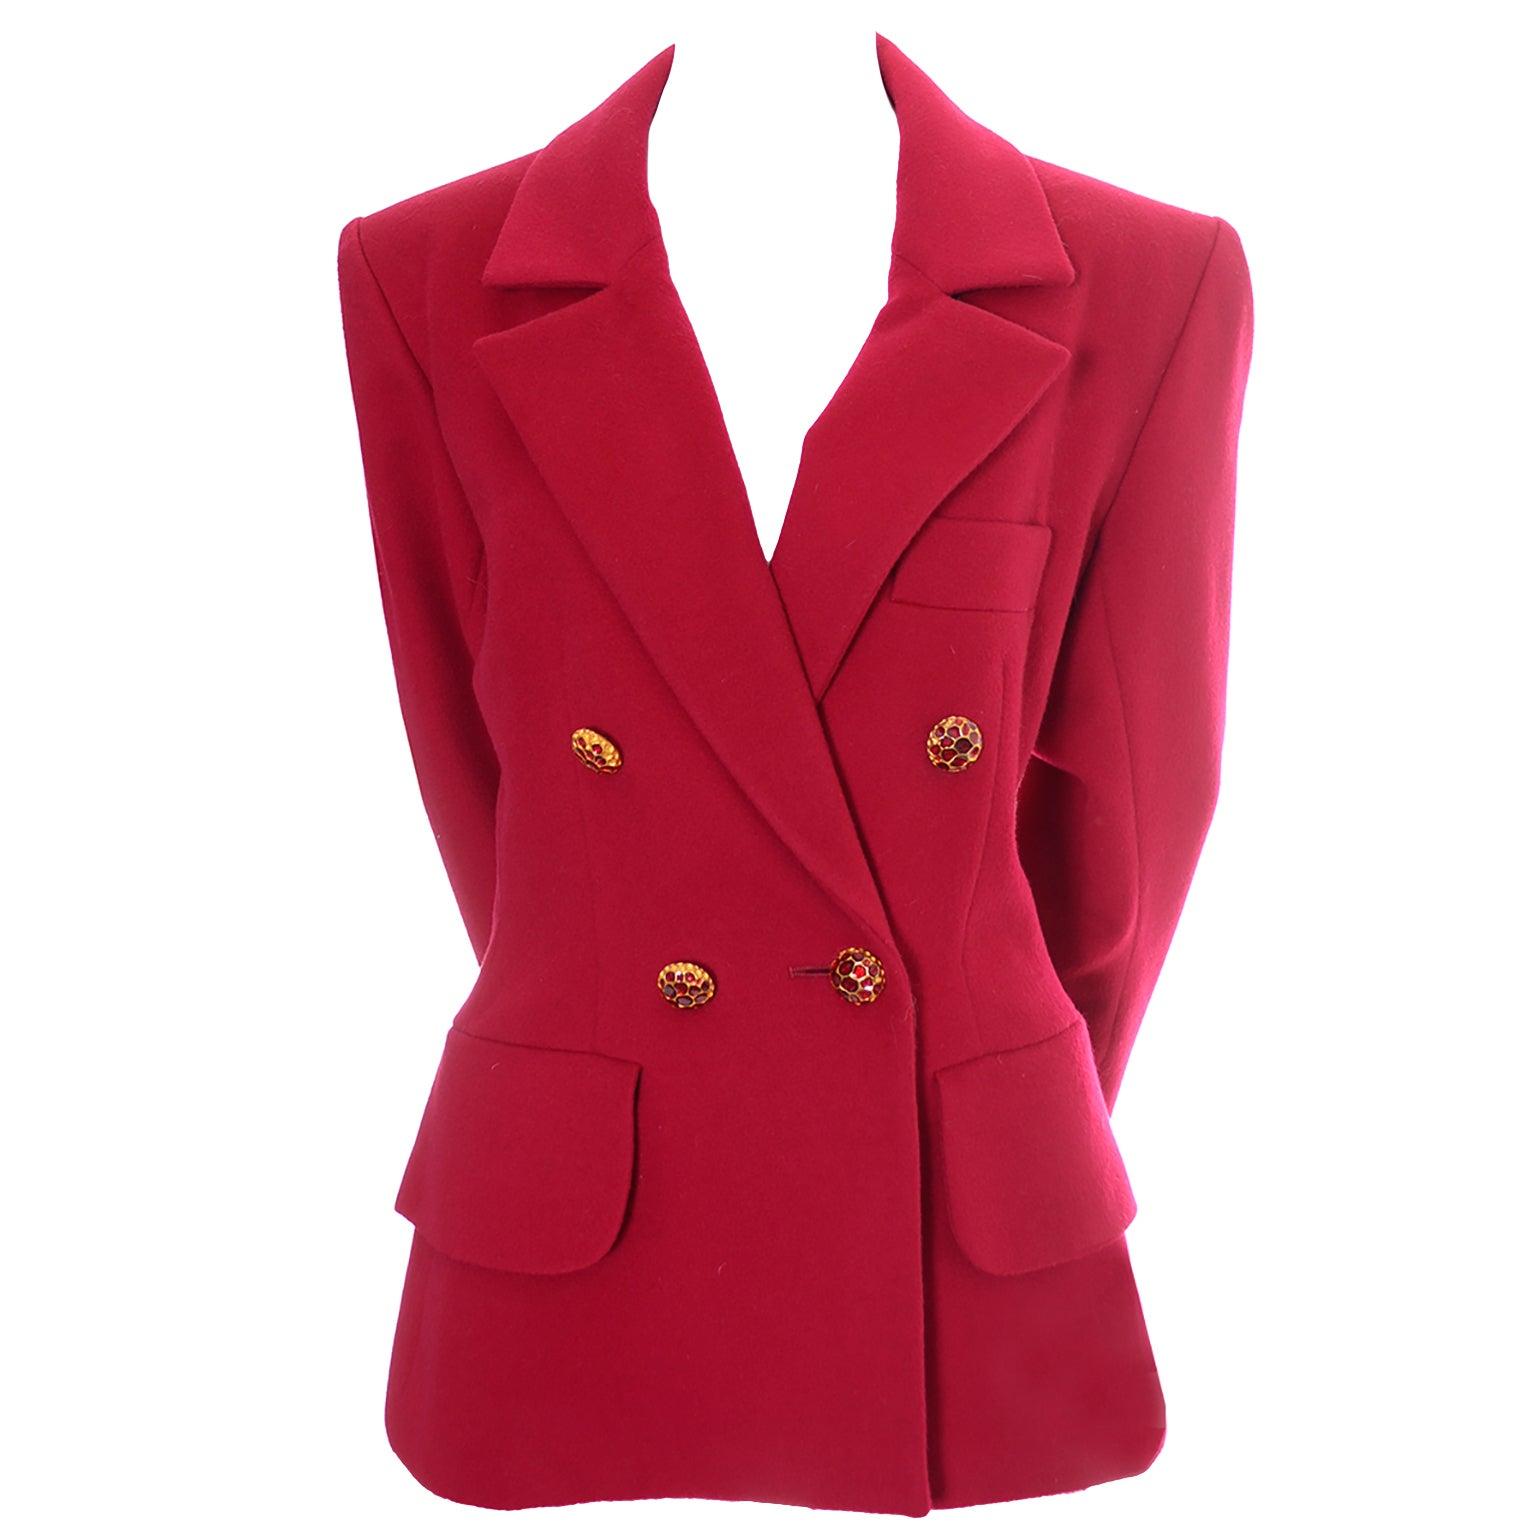 e4e8bc99 YSL Vintage Yves Saint Laurent Raspberry Red Wool Blazer Jacket